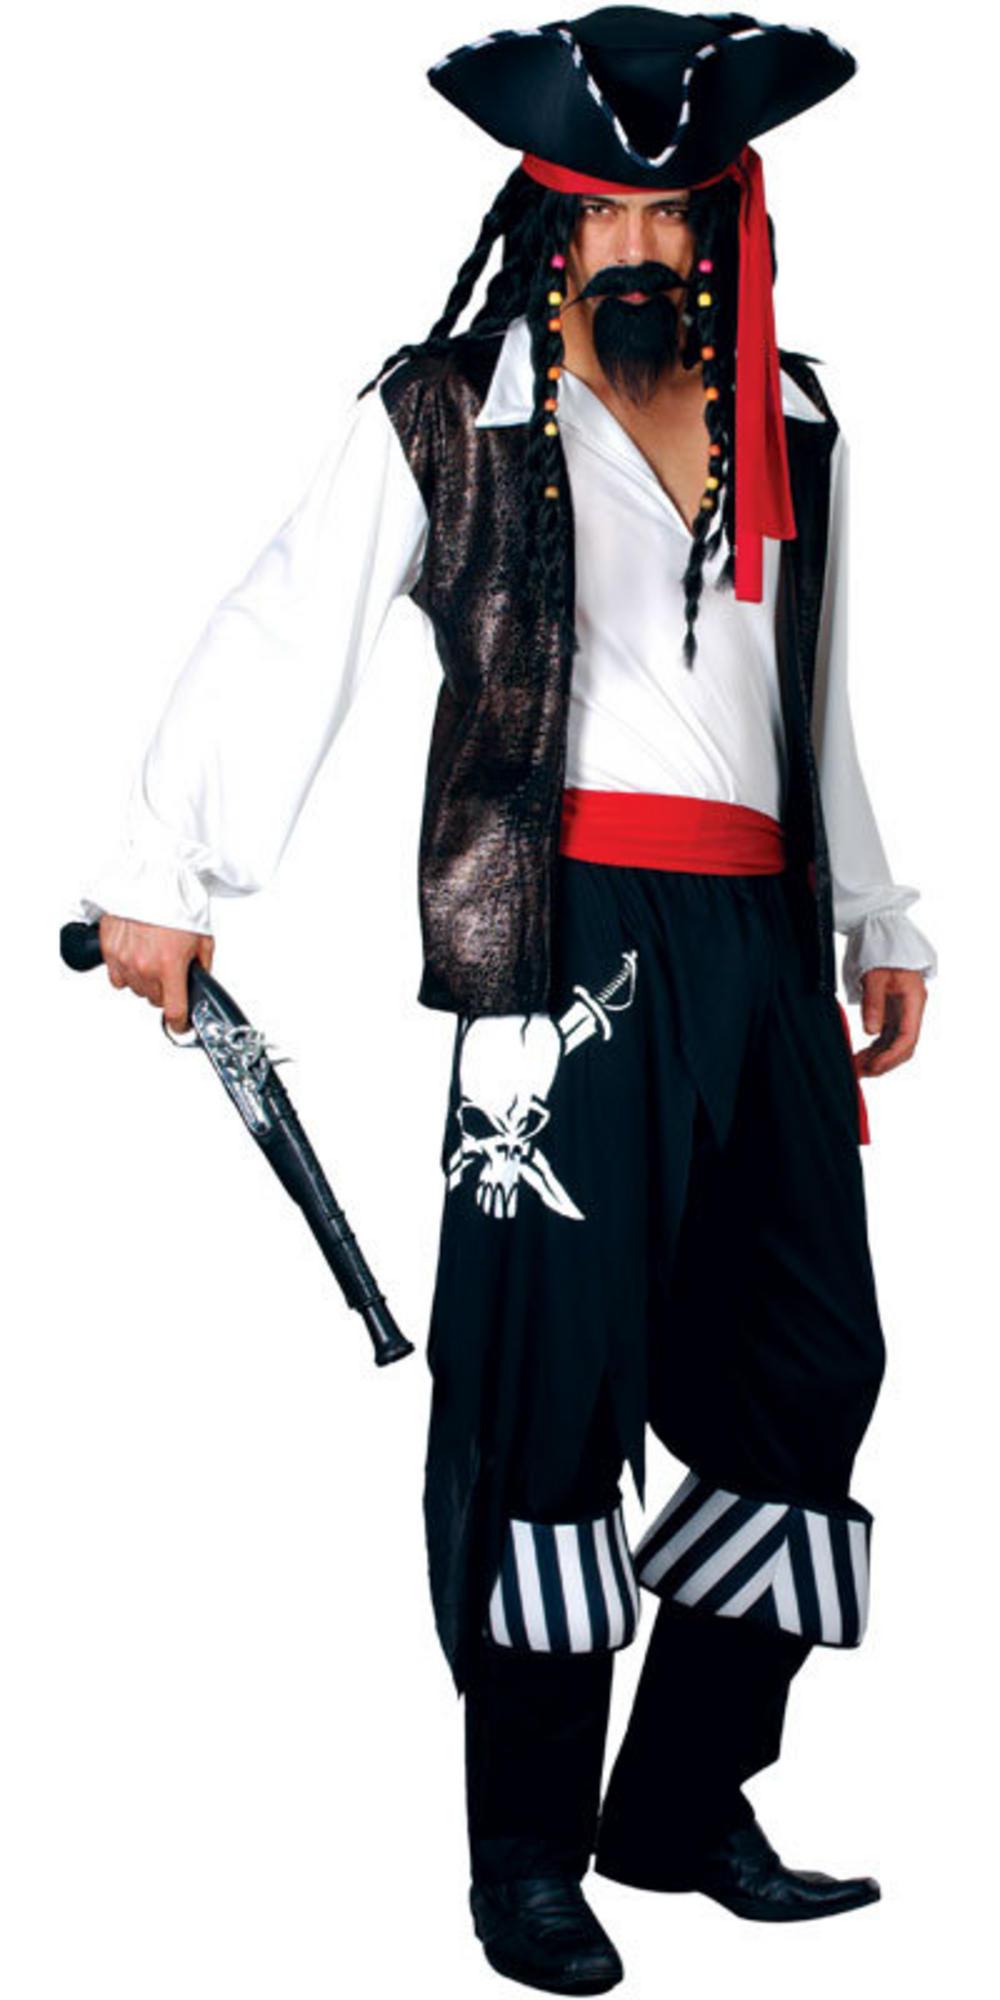 Костюм пирата своими руками : варианты создания образа и фото Lucky Girl 53